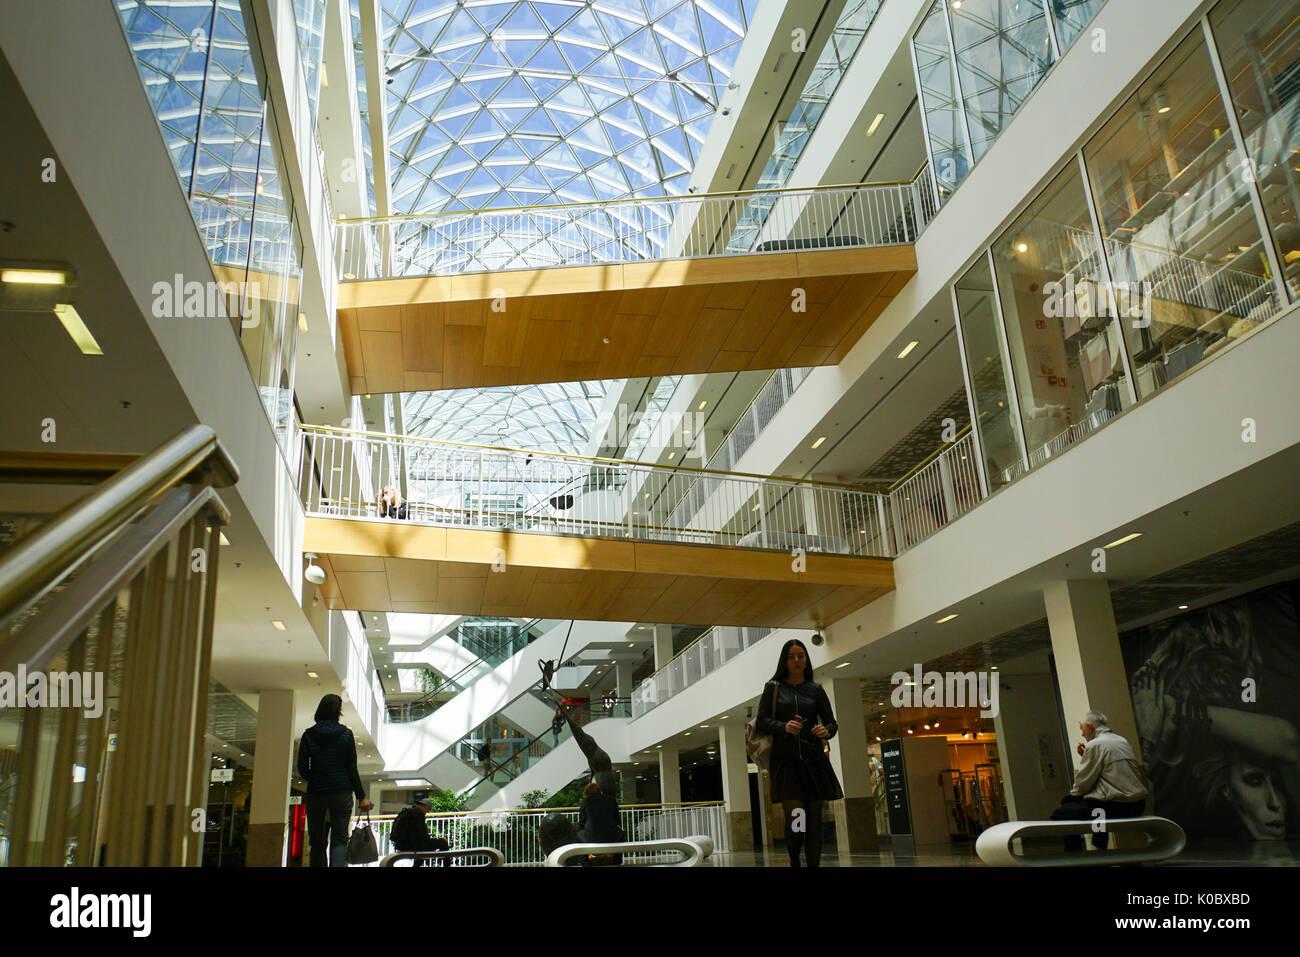 La Lituanie, Vilnius, la Gedimino 9 shopping mall, Gedimino 9 prospekta Banque D'Images